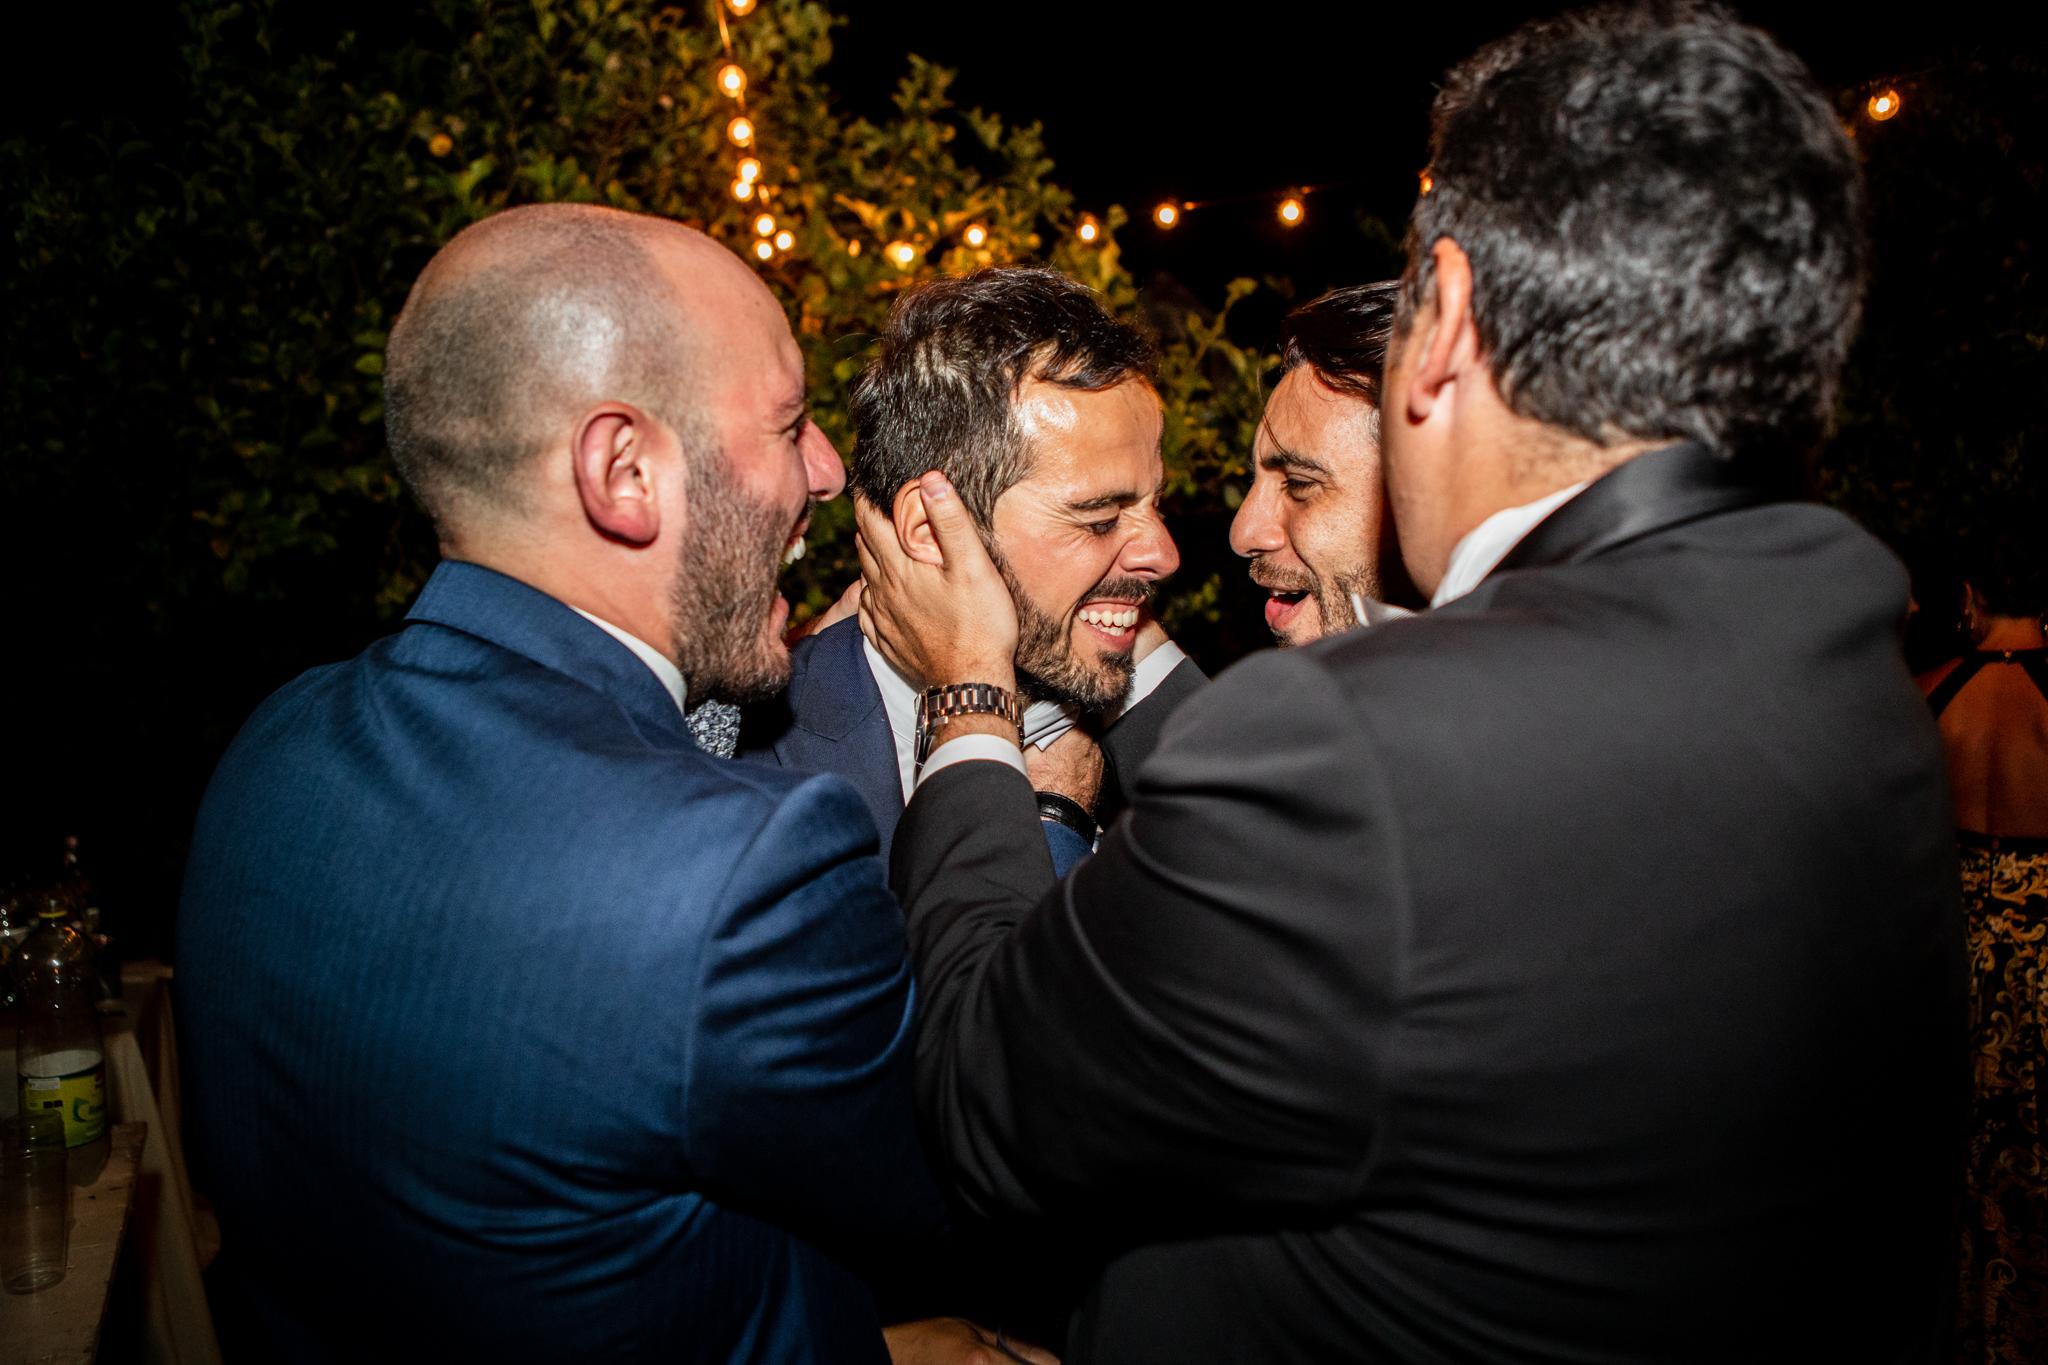 Best-wedding-photographer-in-Sicily- Catania-44.jpg